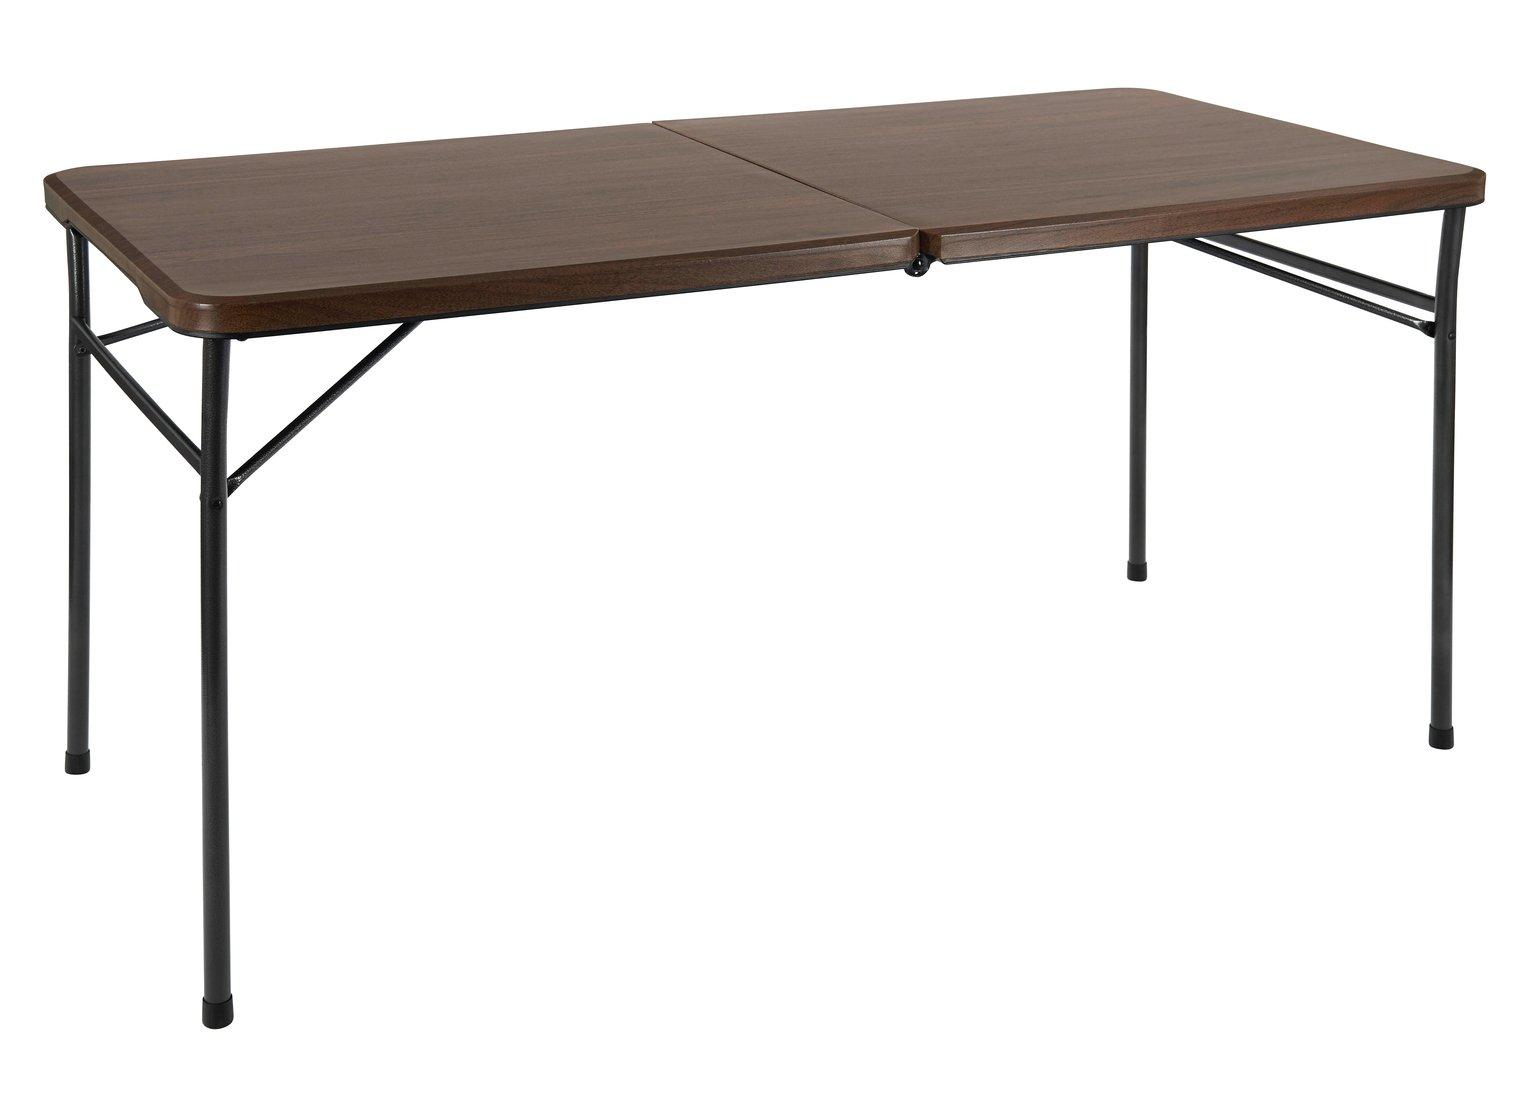 Greenhurst 4ft Folding Table. lowest price